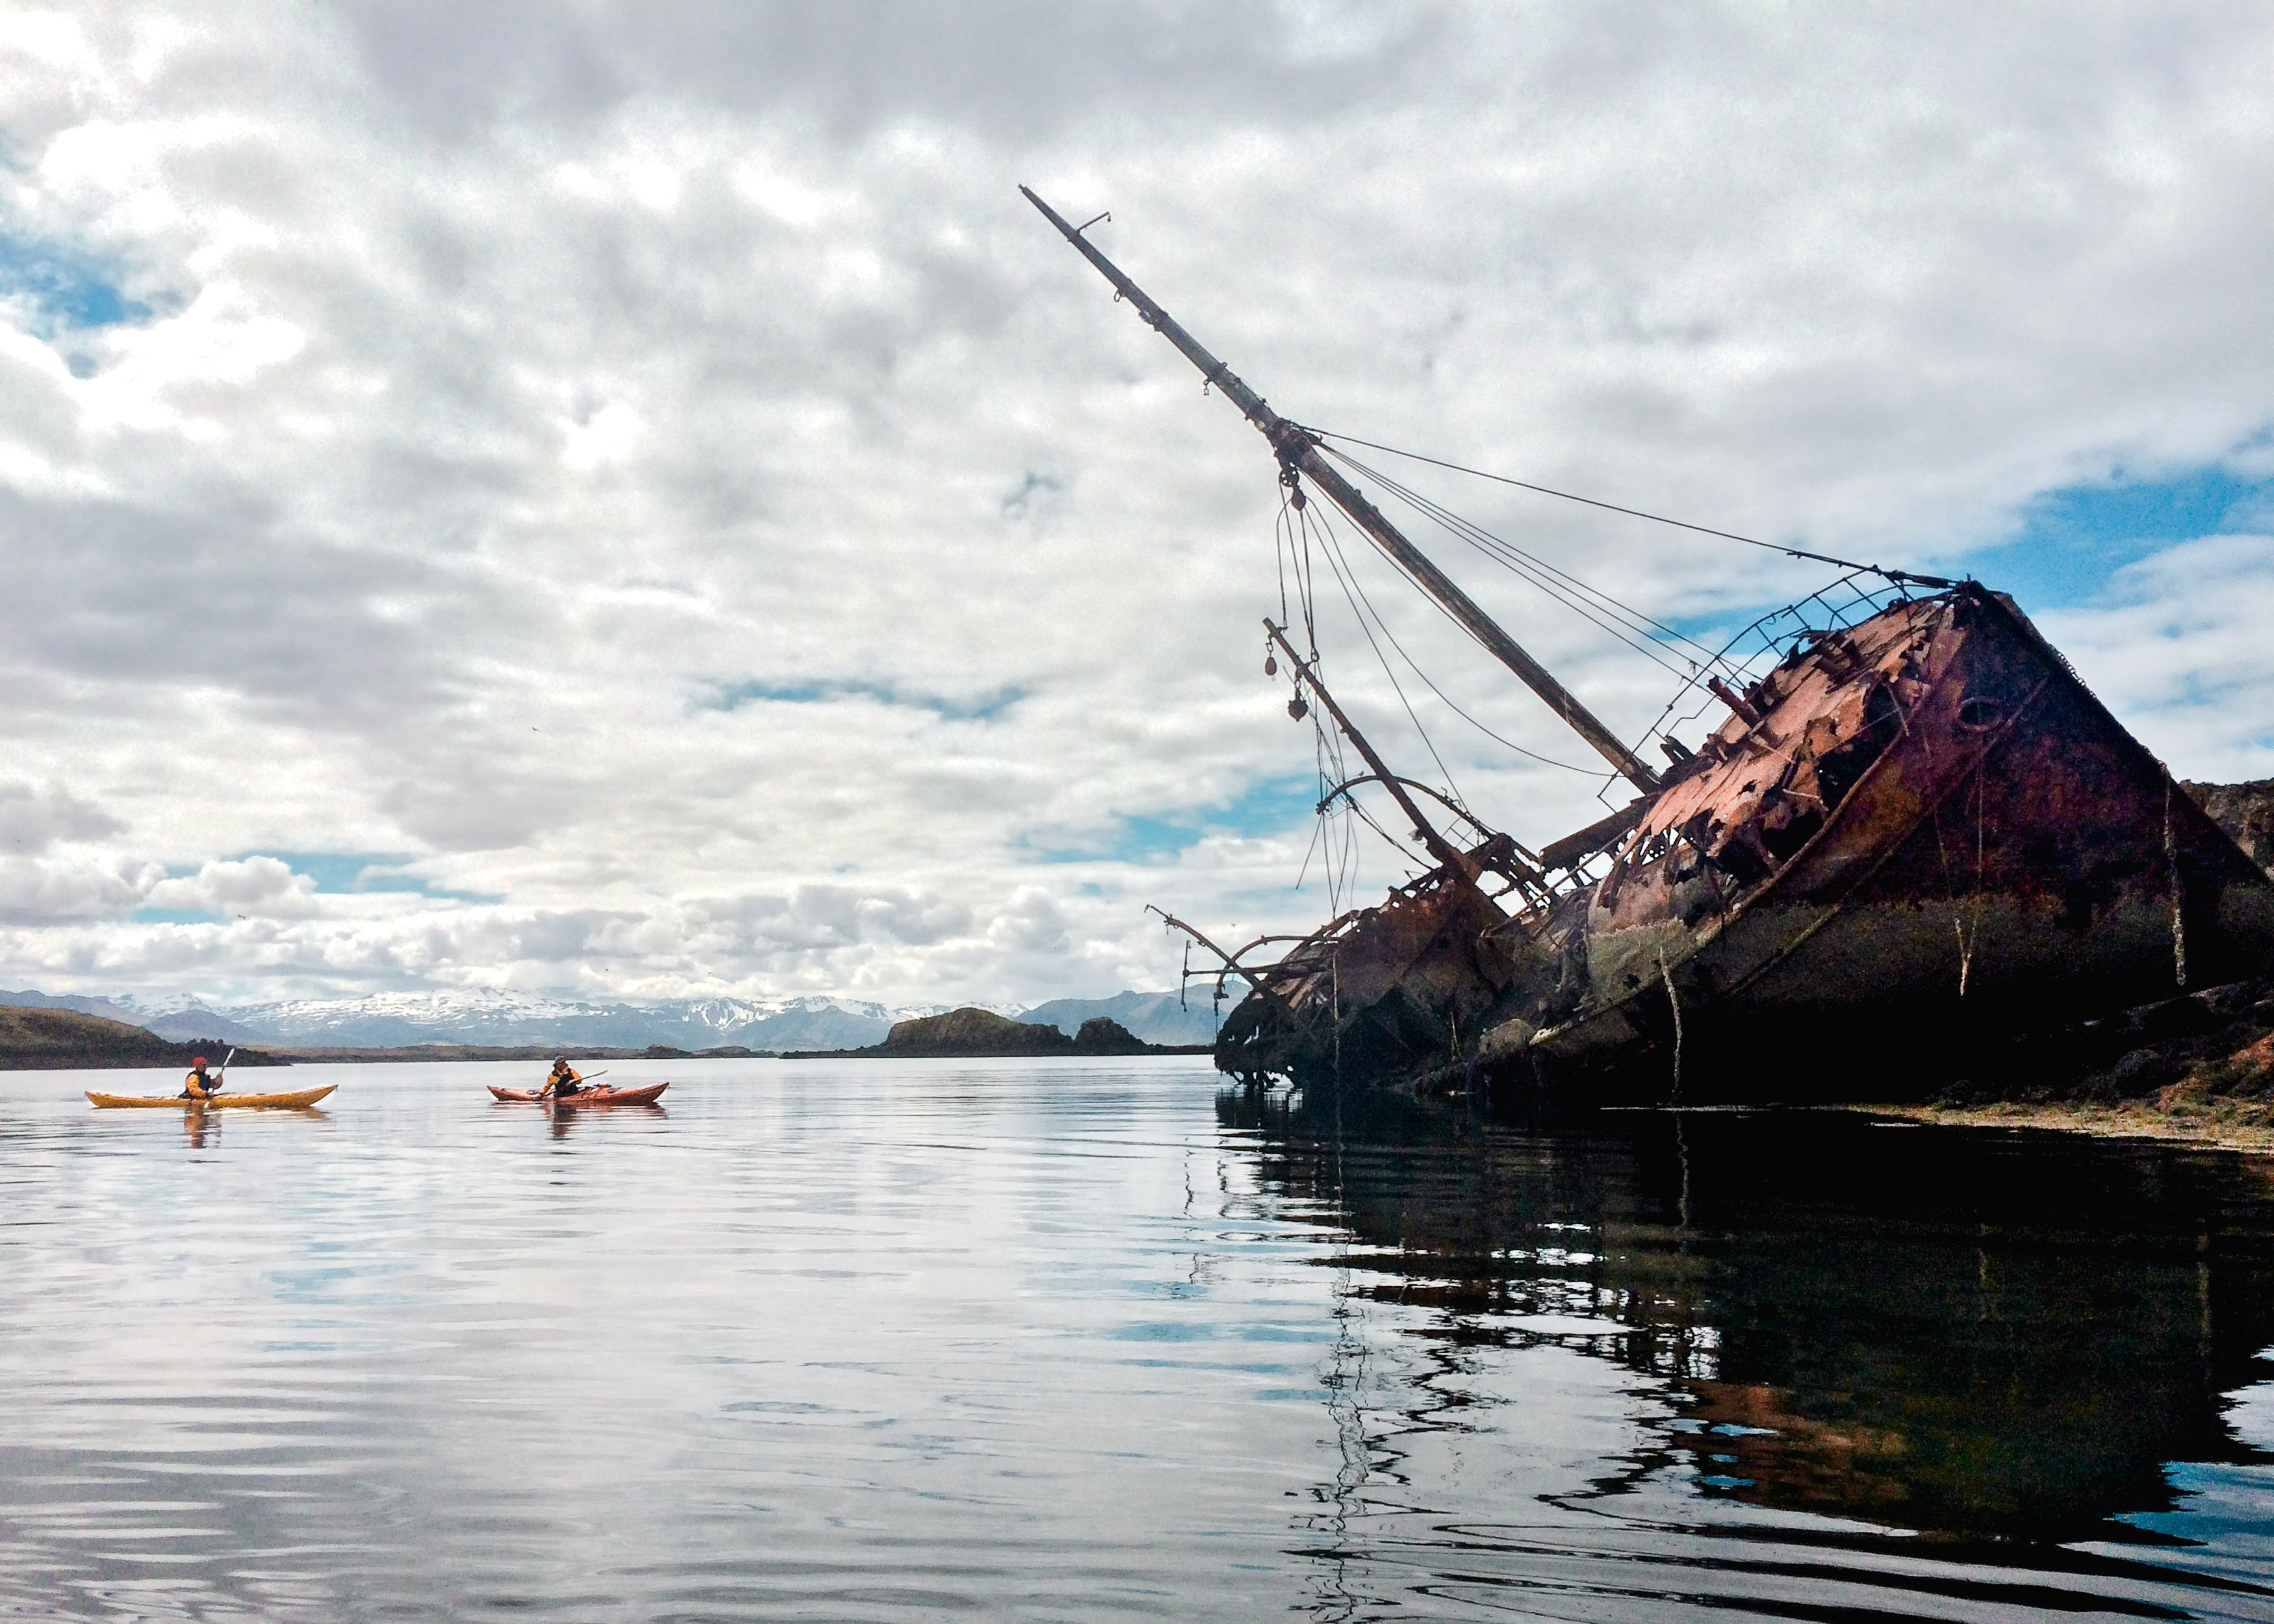 A wrecked fishing trawler which sits on an island in Breiðafjörður Bay.